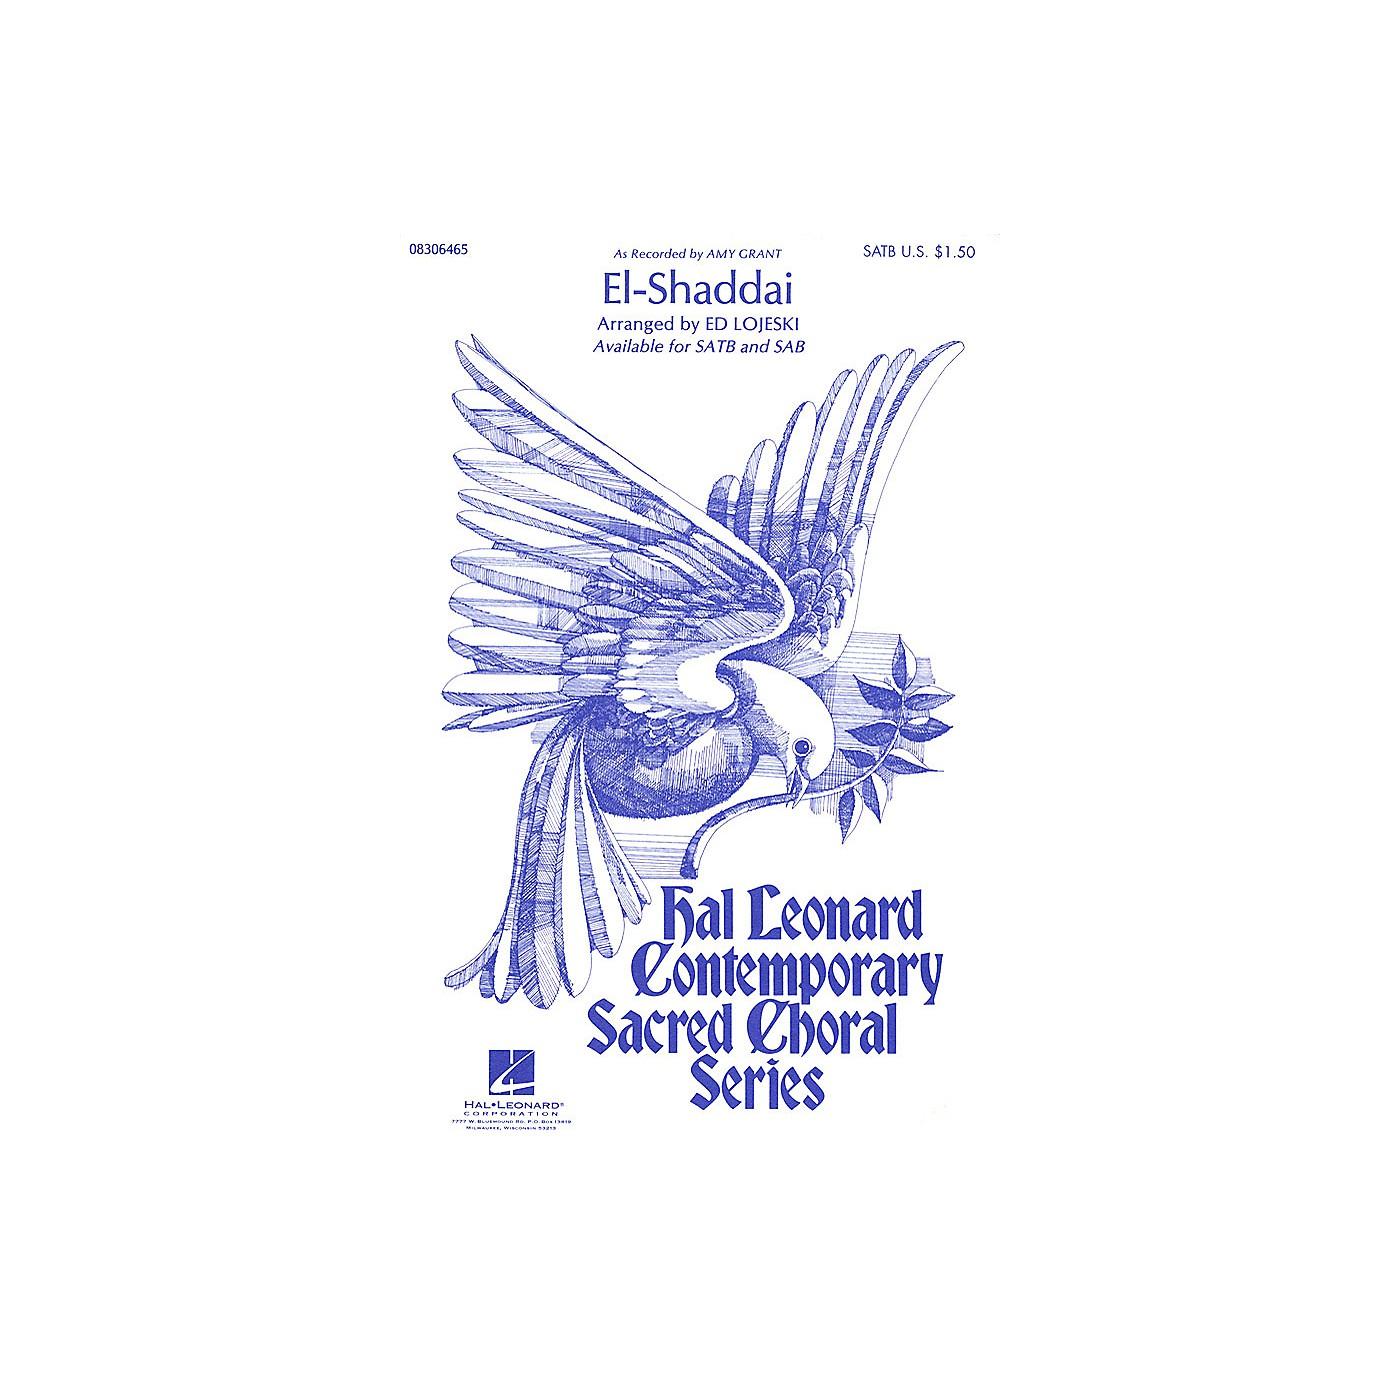 Hal Leonard El-Shaddai SATB by Amy Grant arranged by Ed Lojeski thumbnail